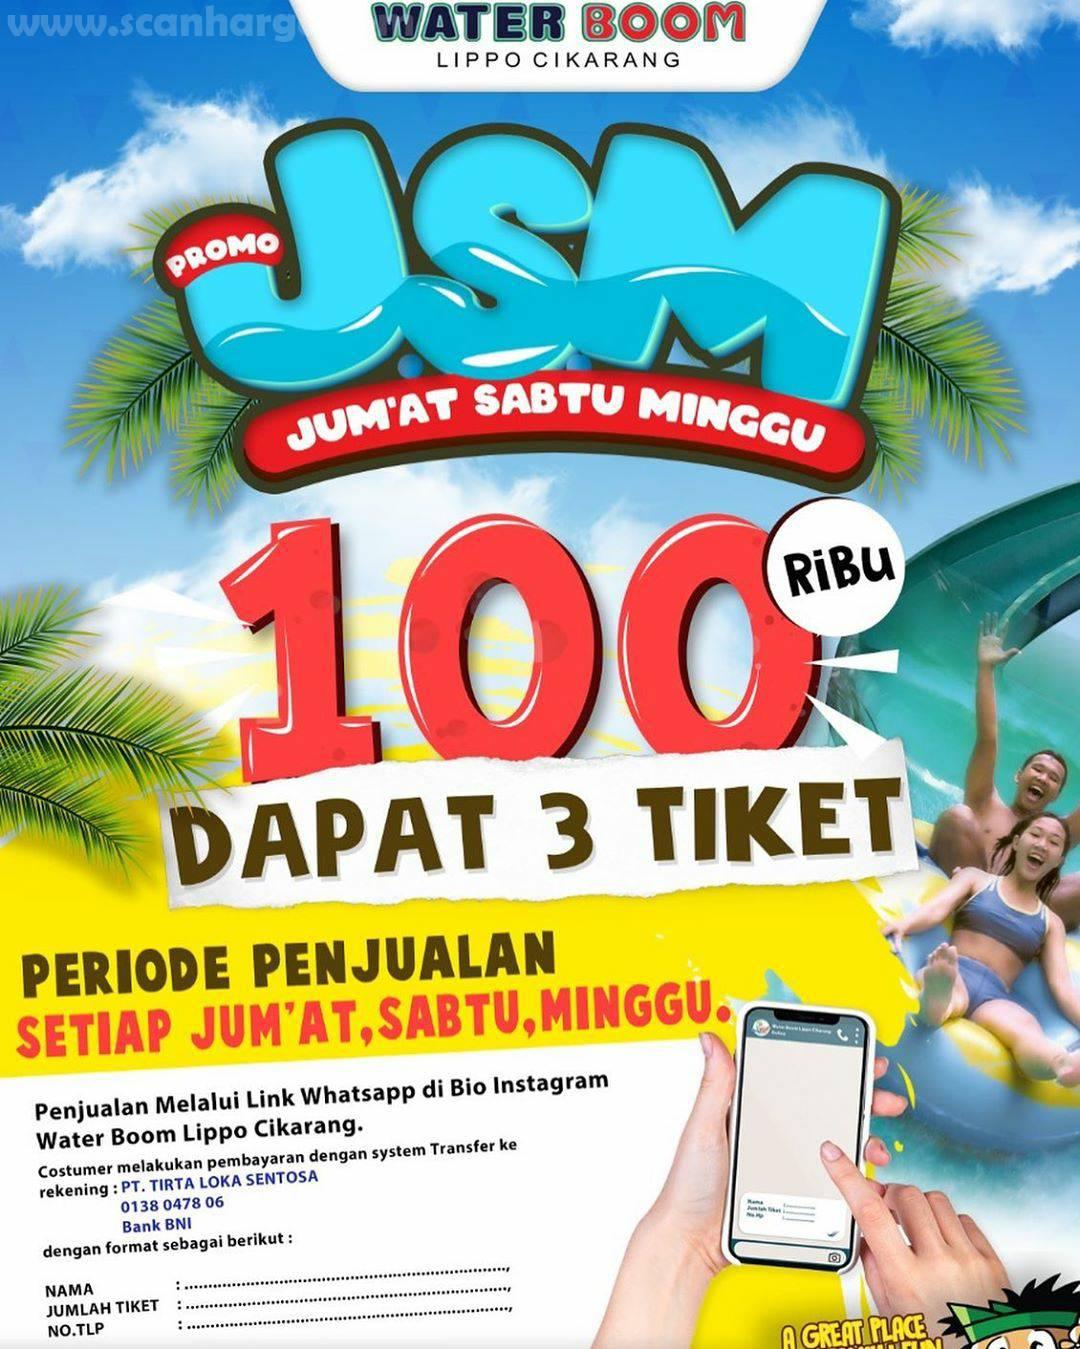 WATERBOOM Promo JSM - 100 Ribu Dapat 3 Tiket